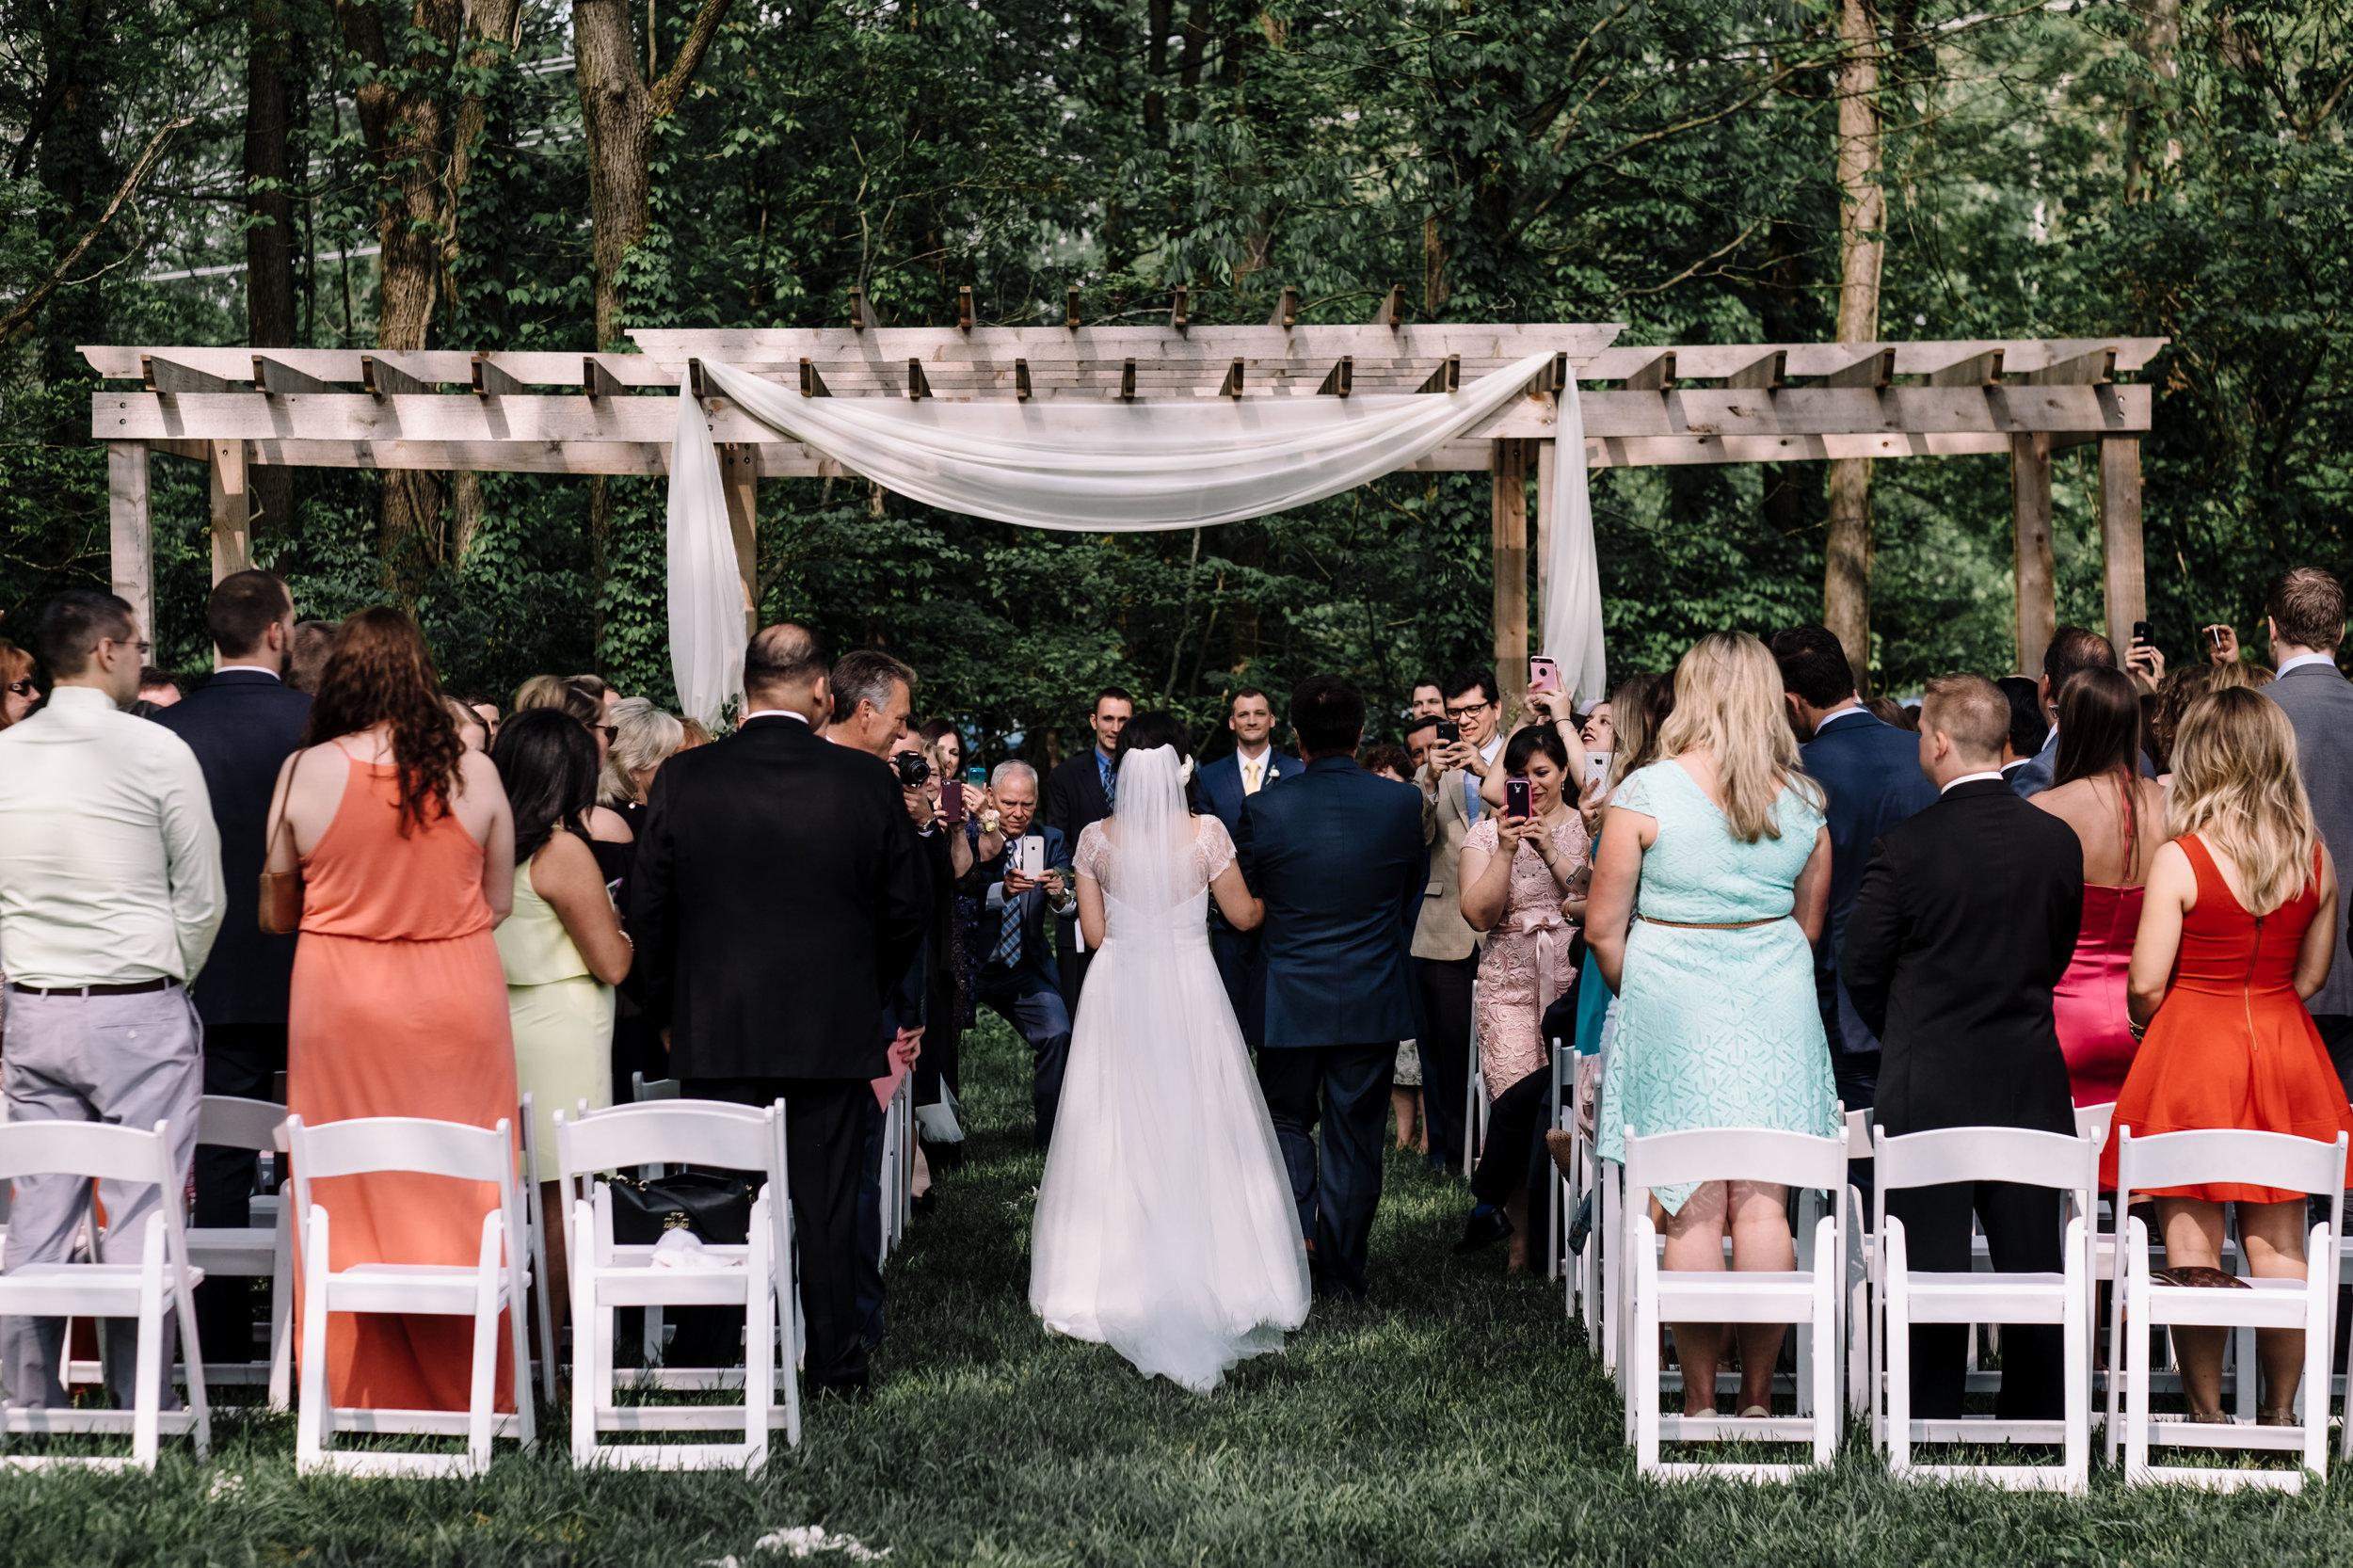 Ana-Dan-Blog-Indianapolis-Wedding-39.jpg